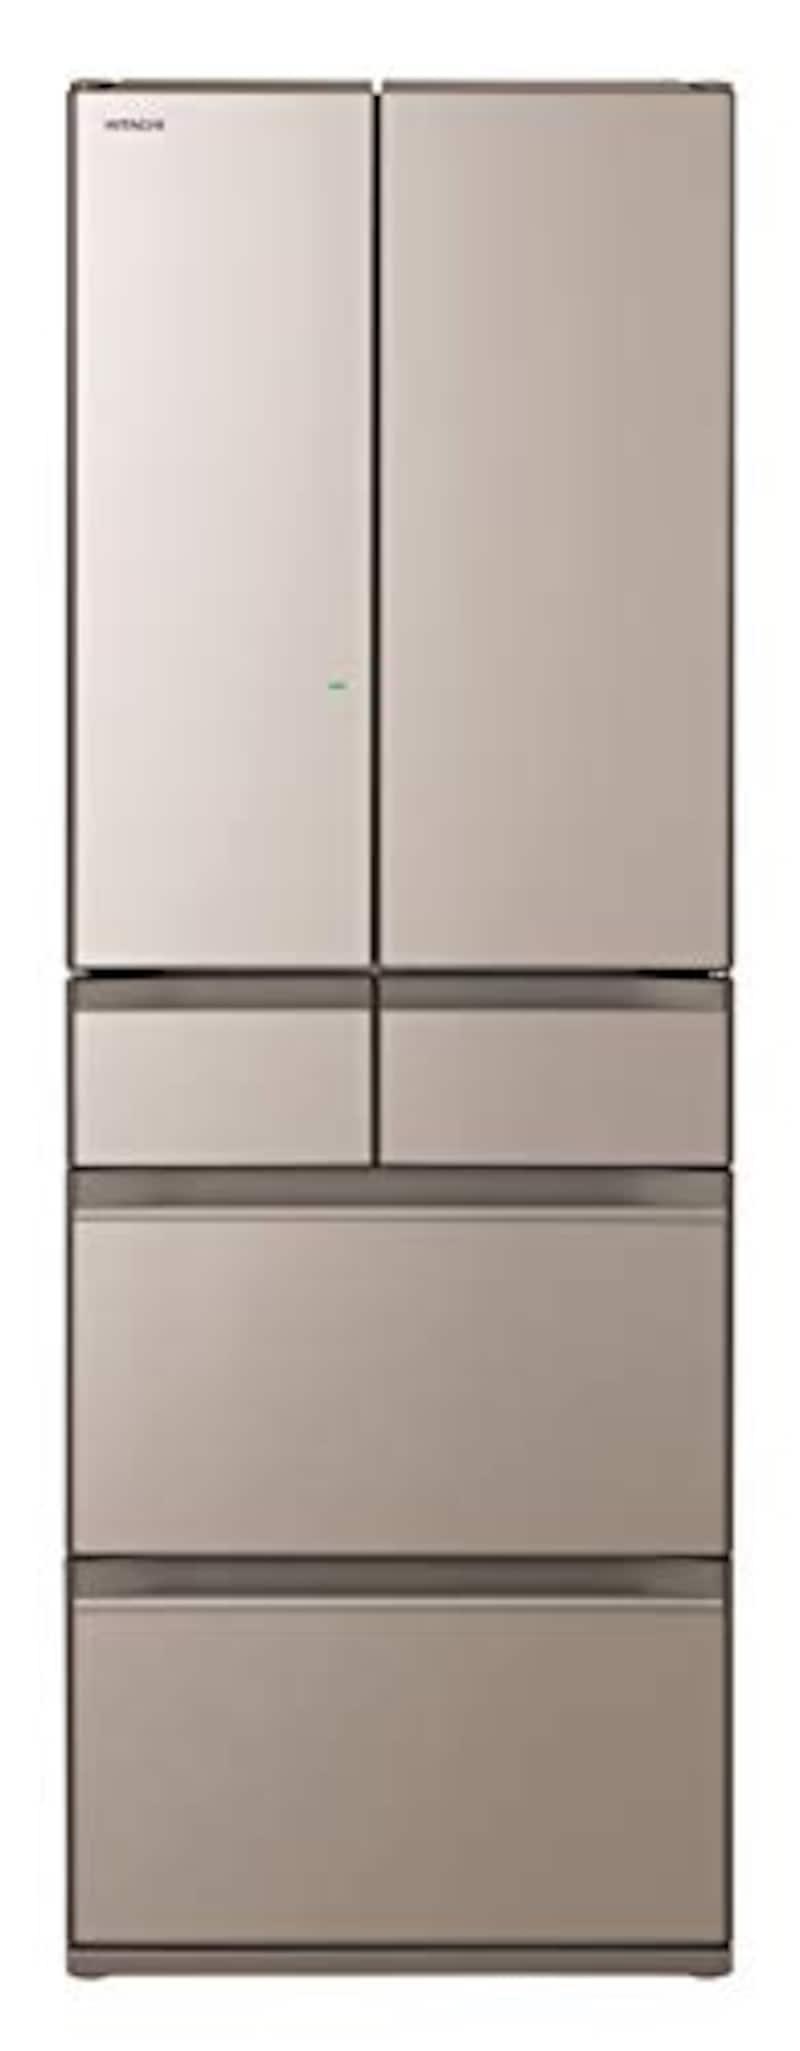 HITACHI(日立),6ドア冷蔵庫 強化処理ガラスドア クリスタルシャンパン,R-HW52N